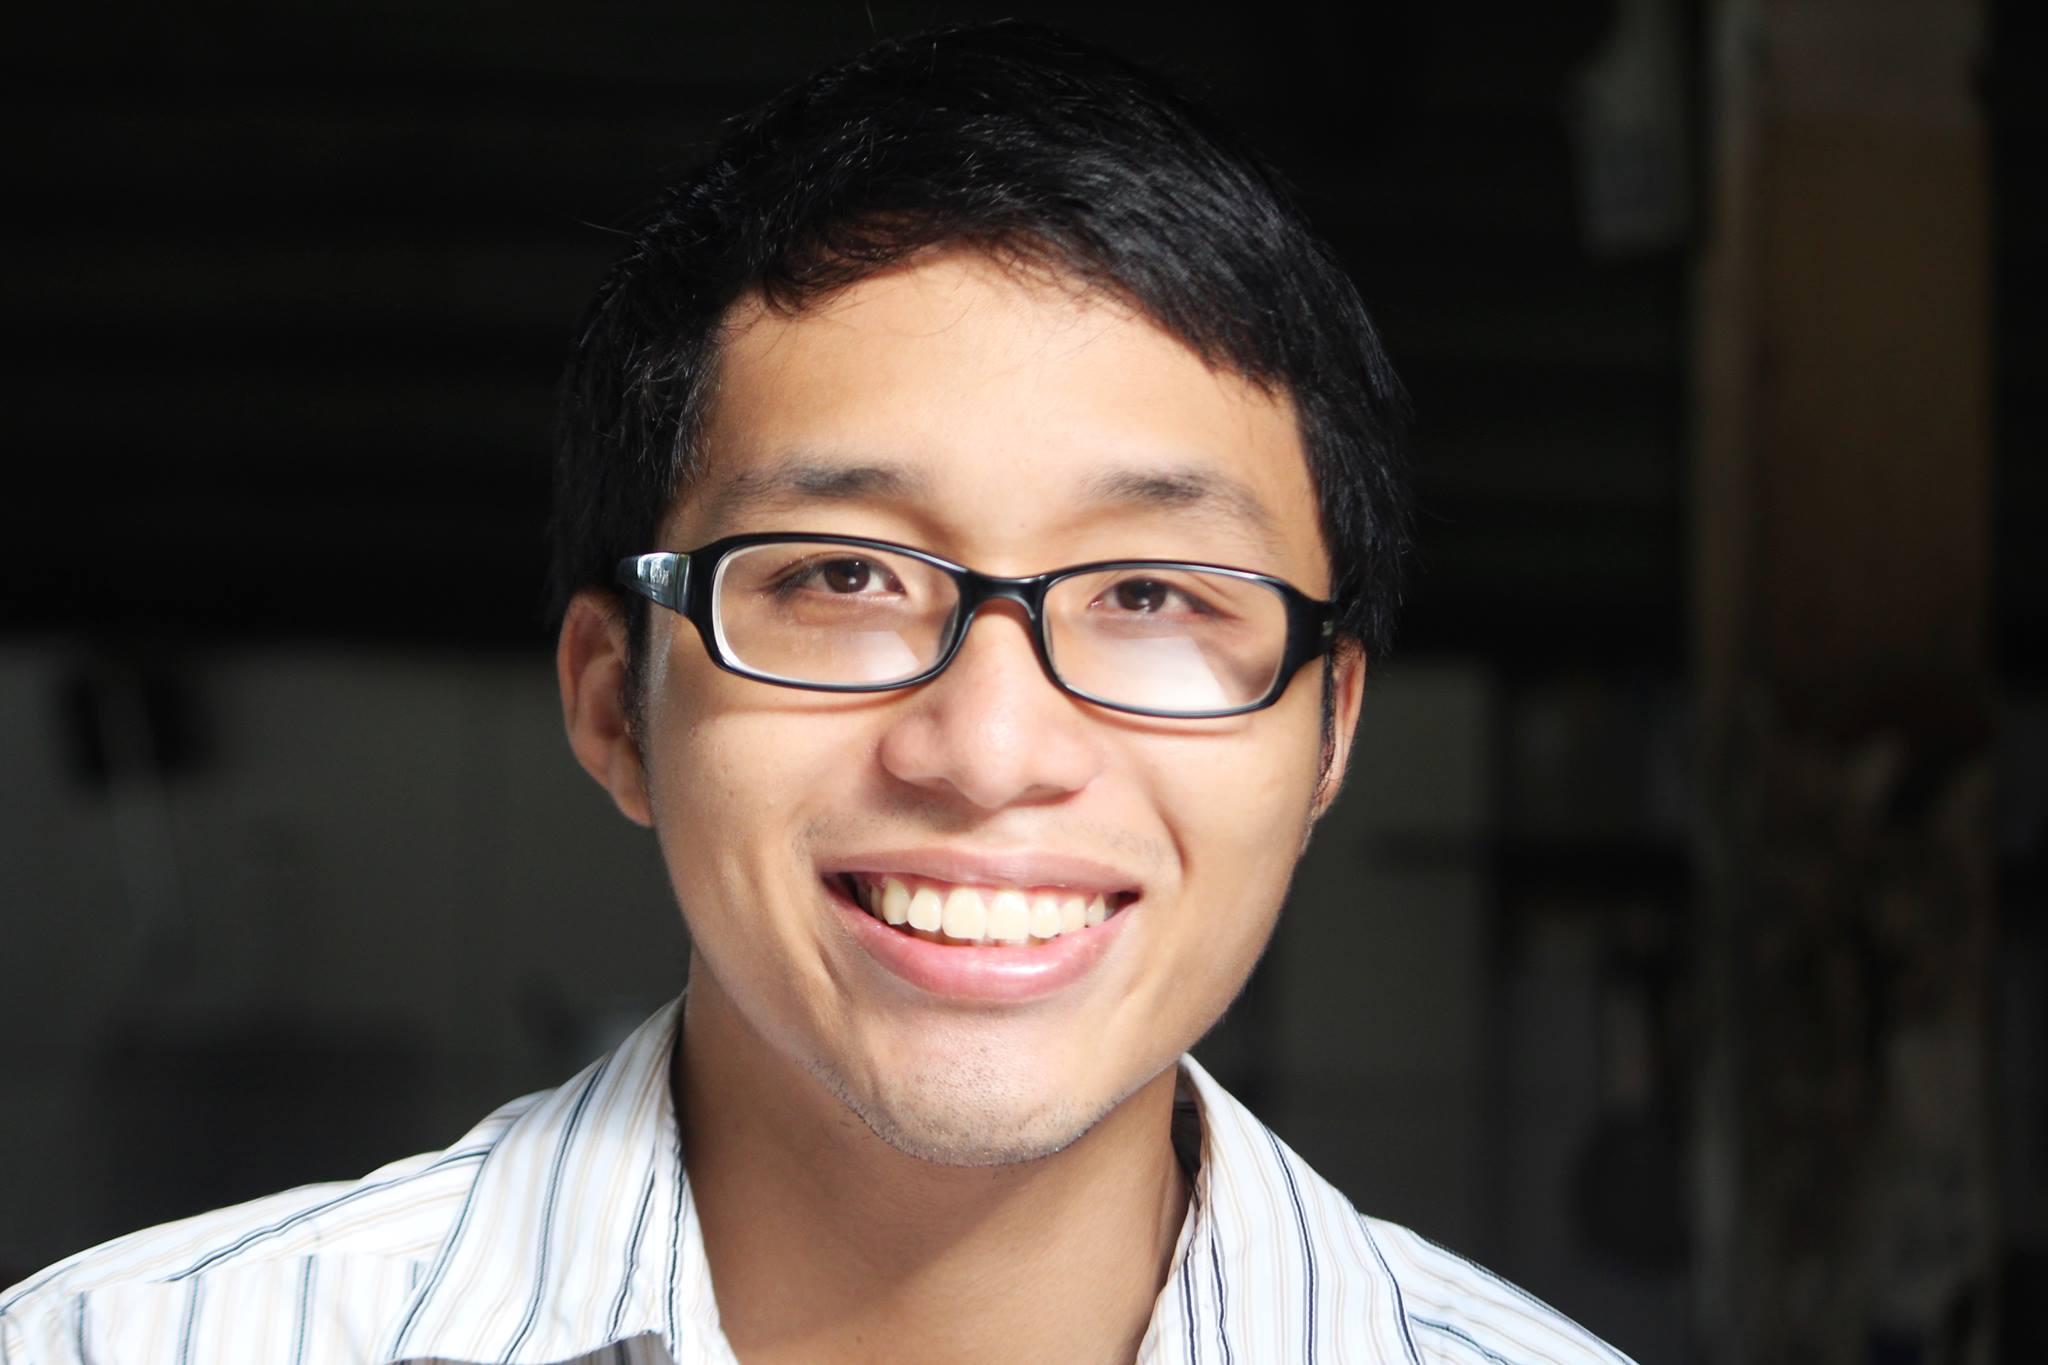 Huỳnh Quang Tuấn